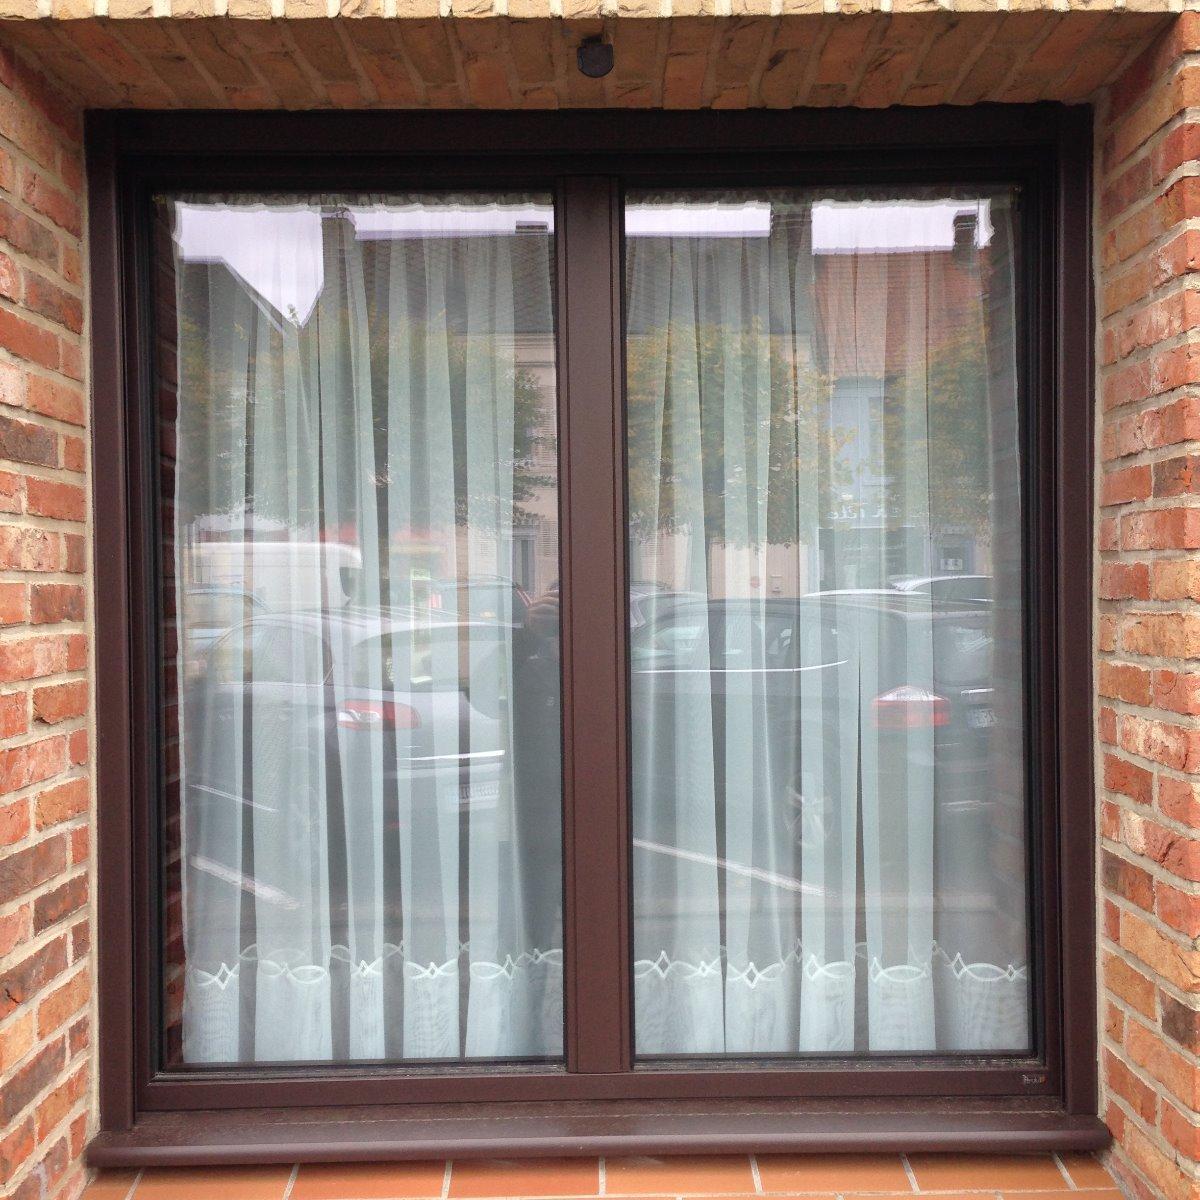 Fenêtre en aluminium marron 1 vantail oscillo-battant avec meneau central - RUE ( 80)